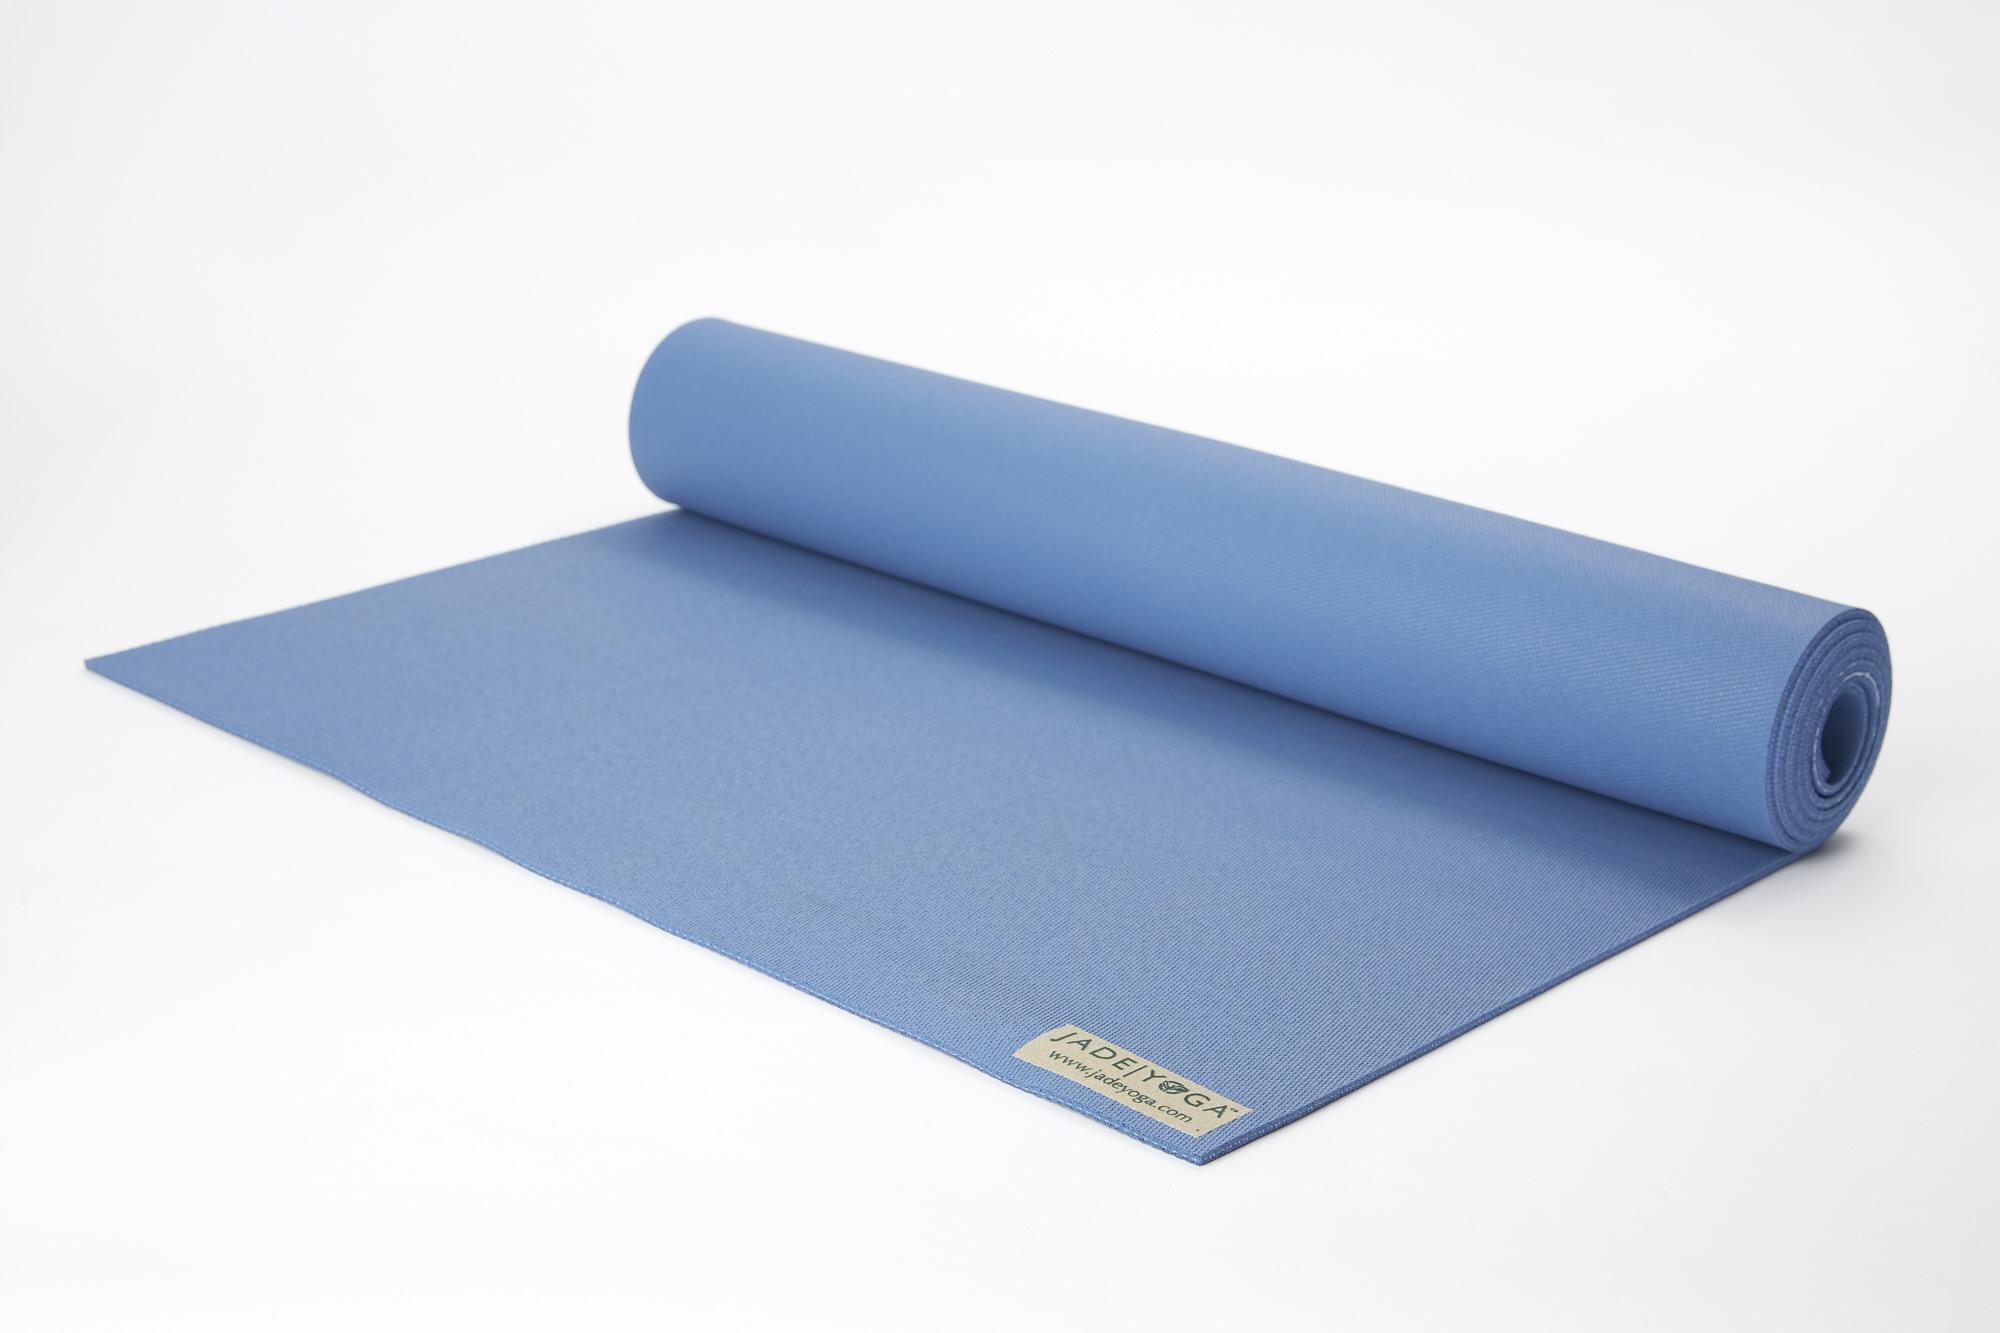 Jade Harmony Yoga Mat Shop For Equipment Simplygreen Gr